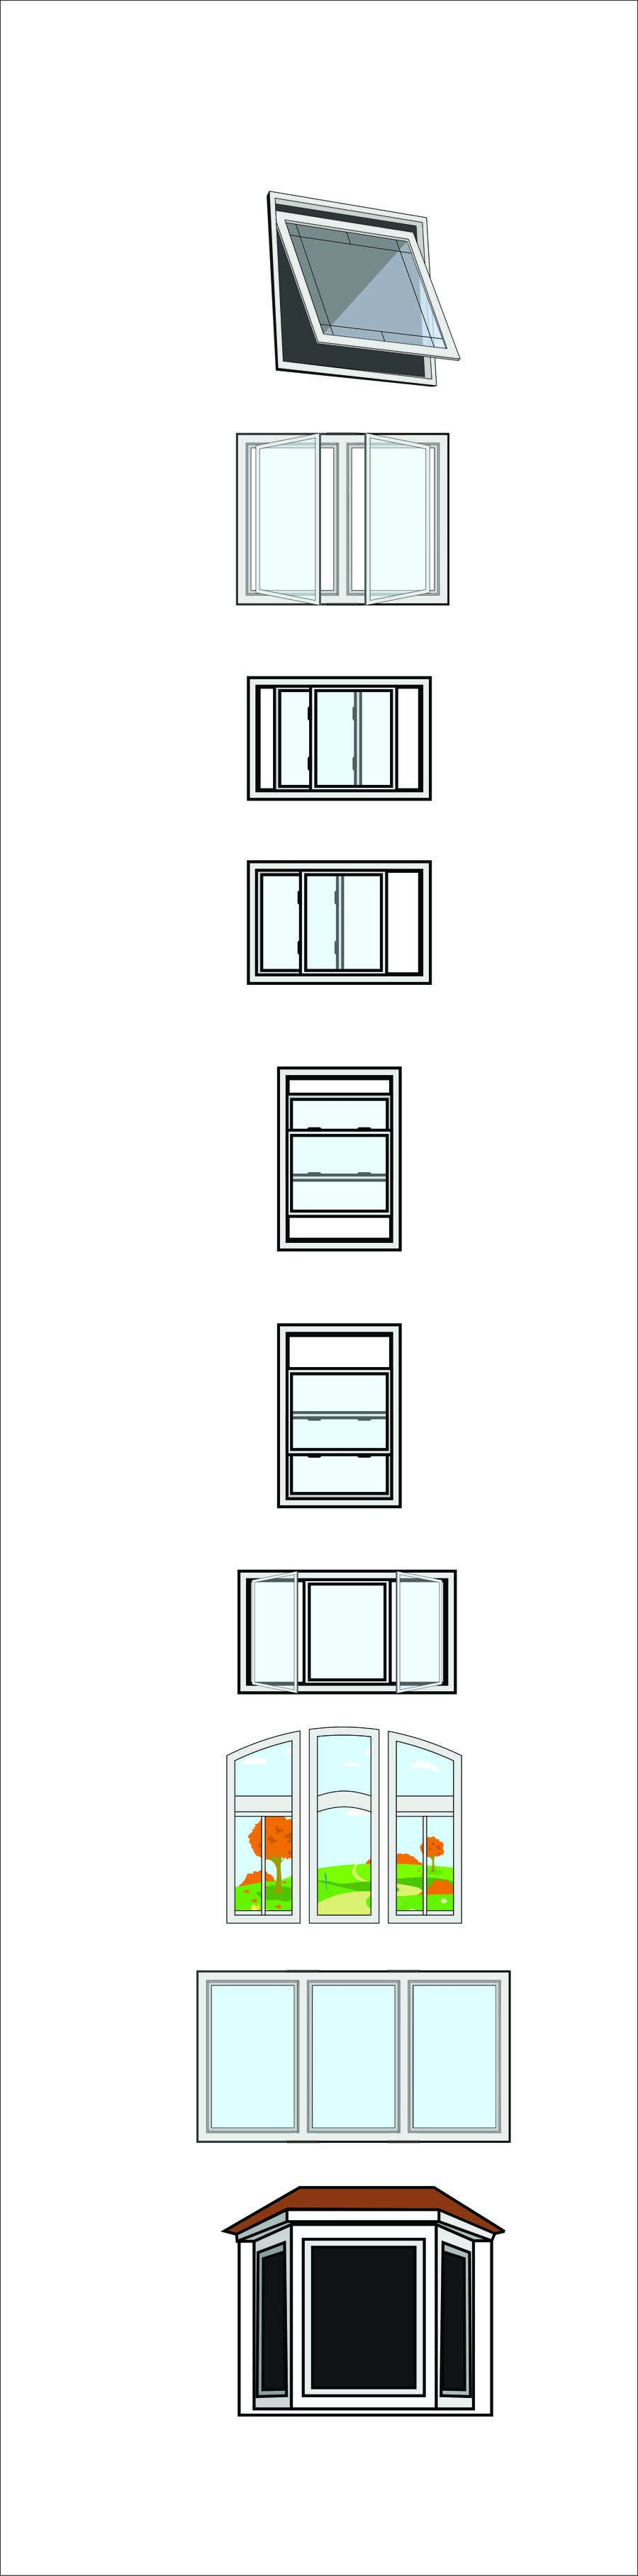 Příspěvek č. 1 do soutěže Design Windows/Doors/Patios Images/Vector Clip Art